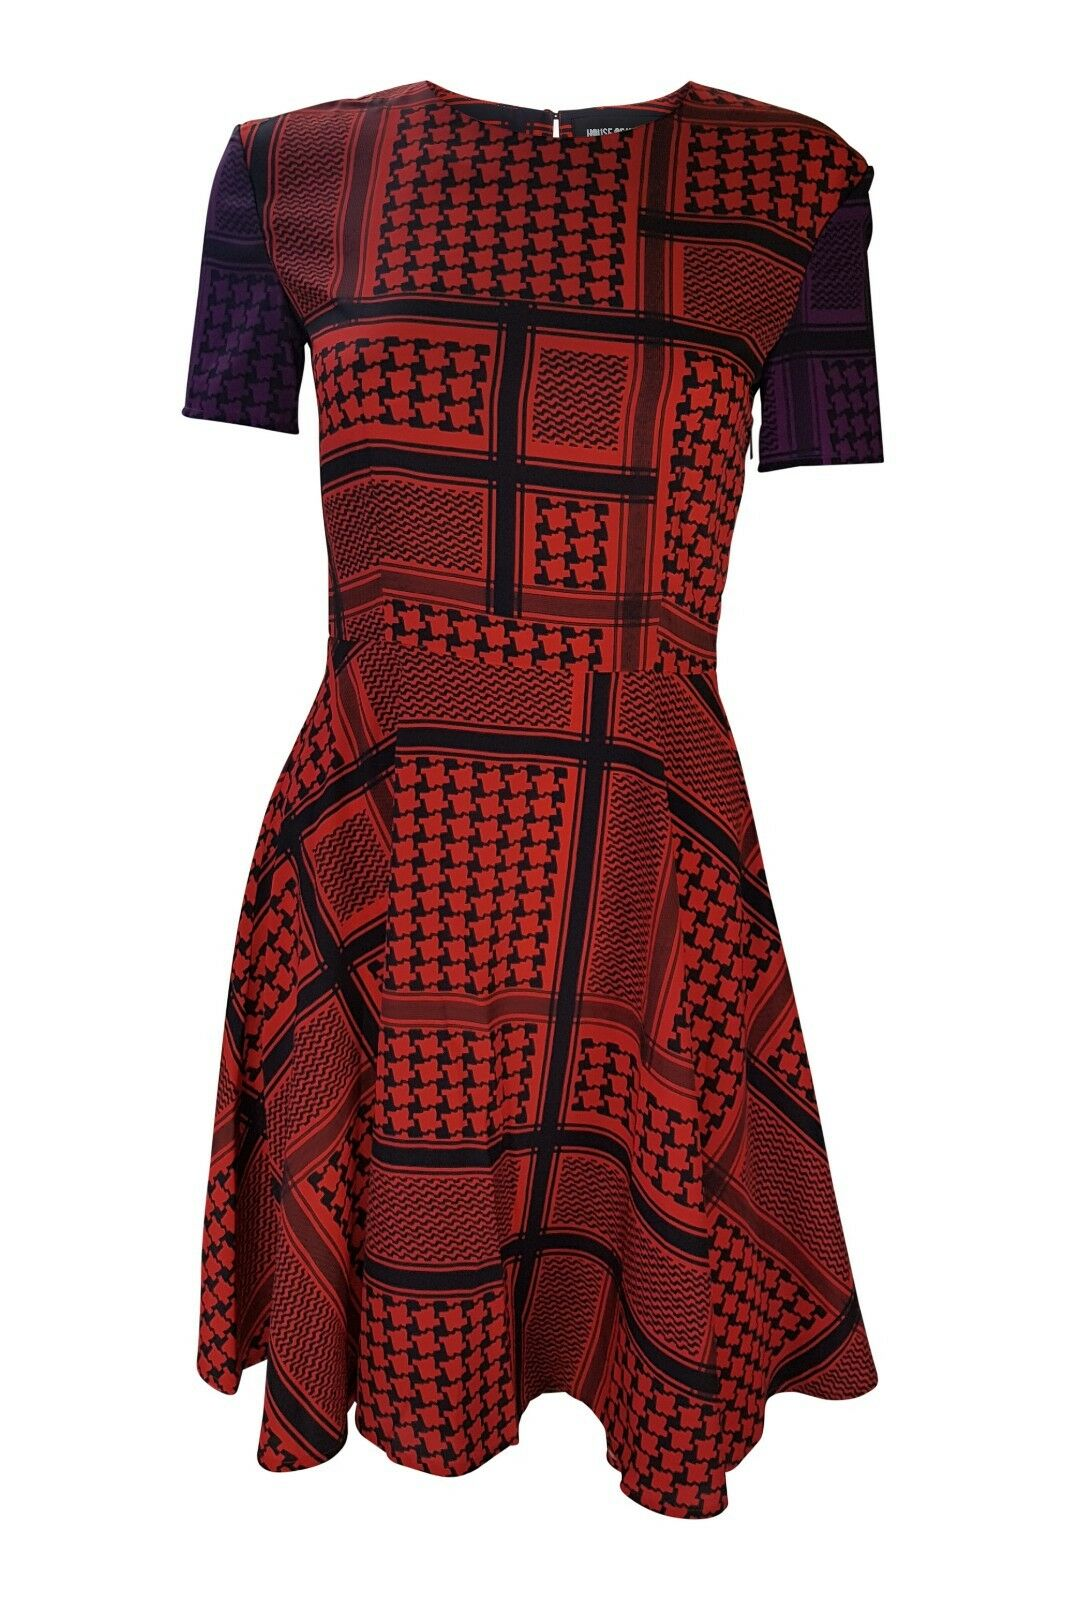 OLANDA HOUSE OF Rosso Geometrica Stampa Skater Dress (8) ae3708